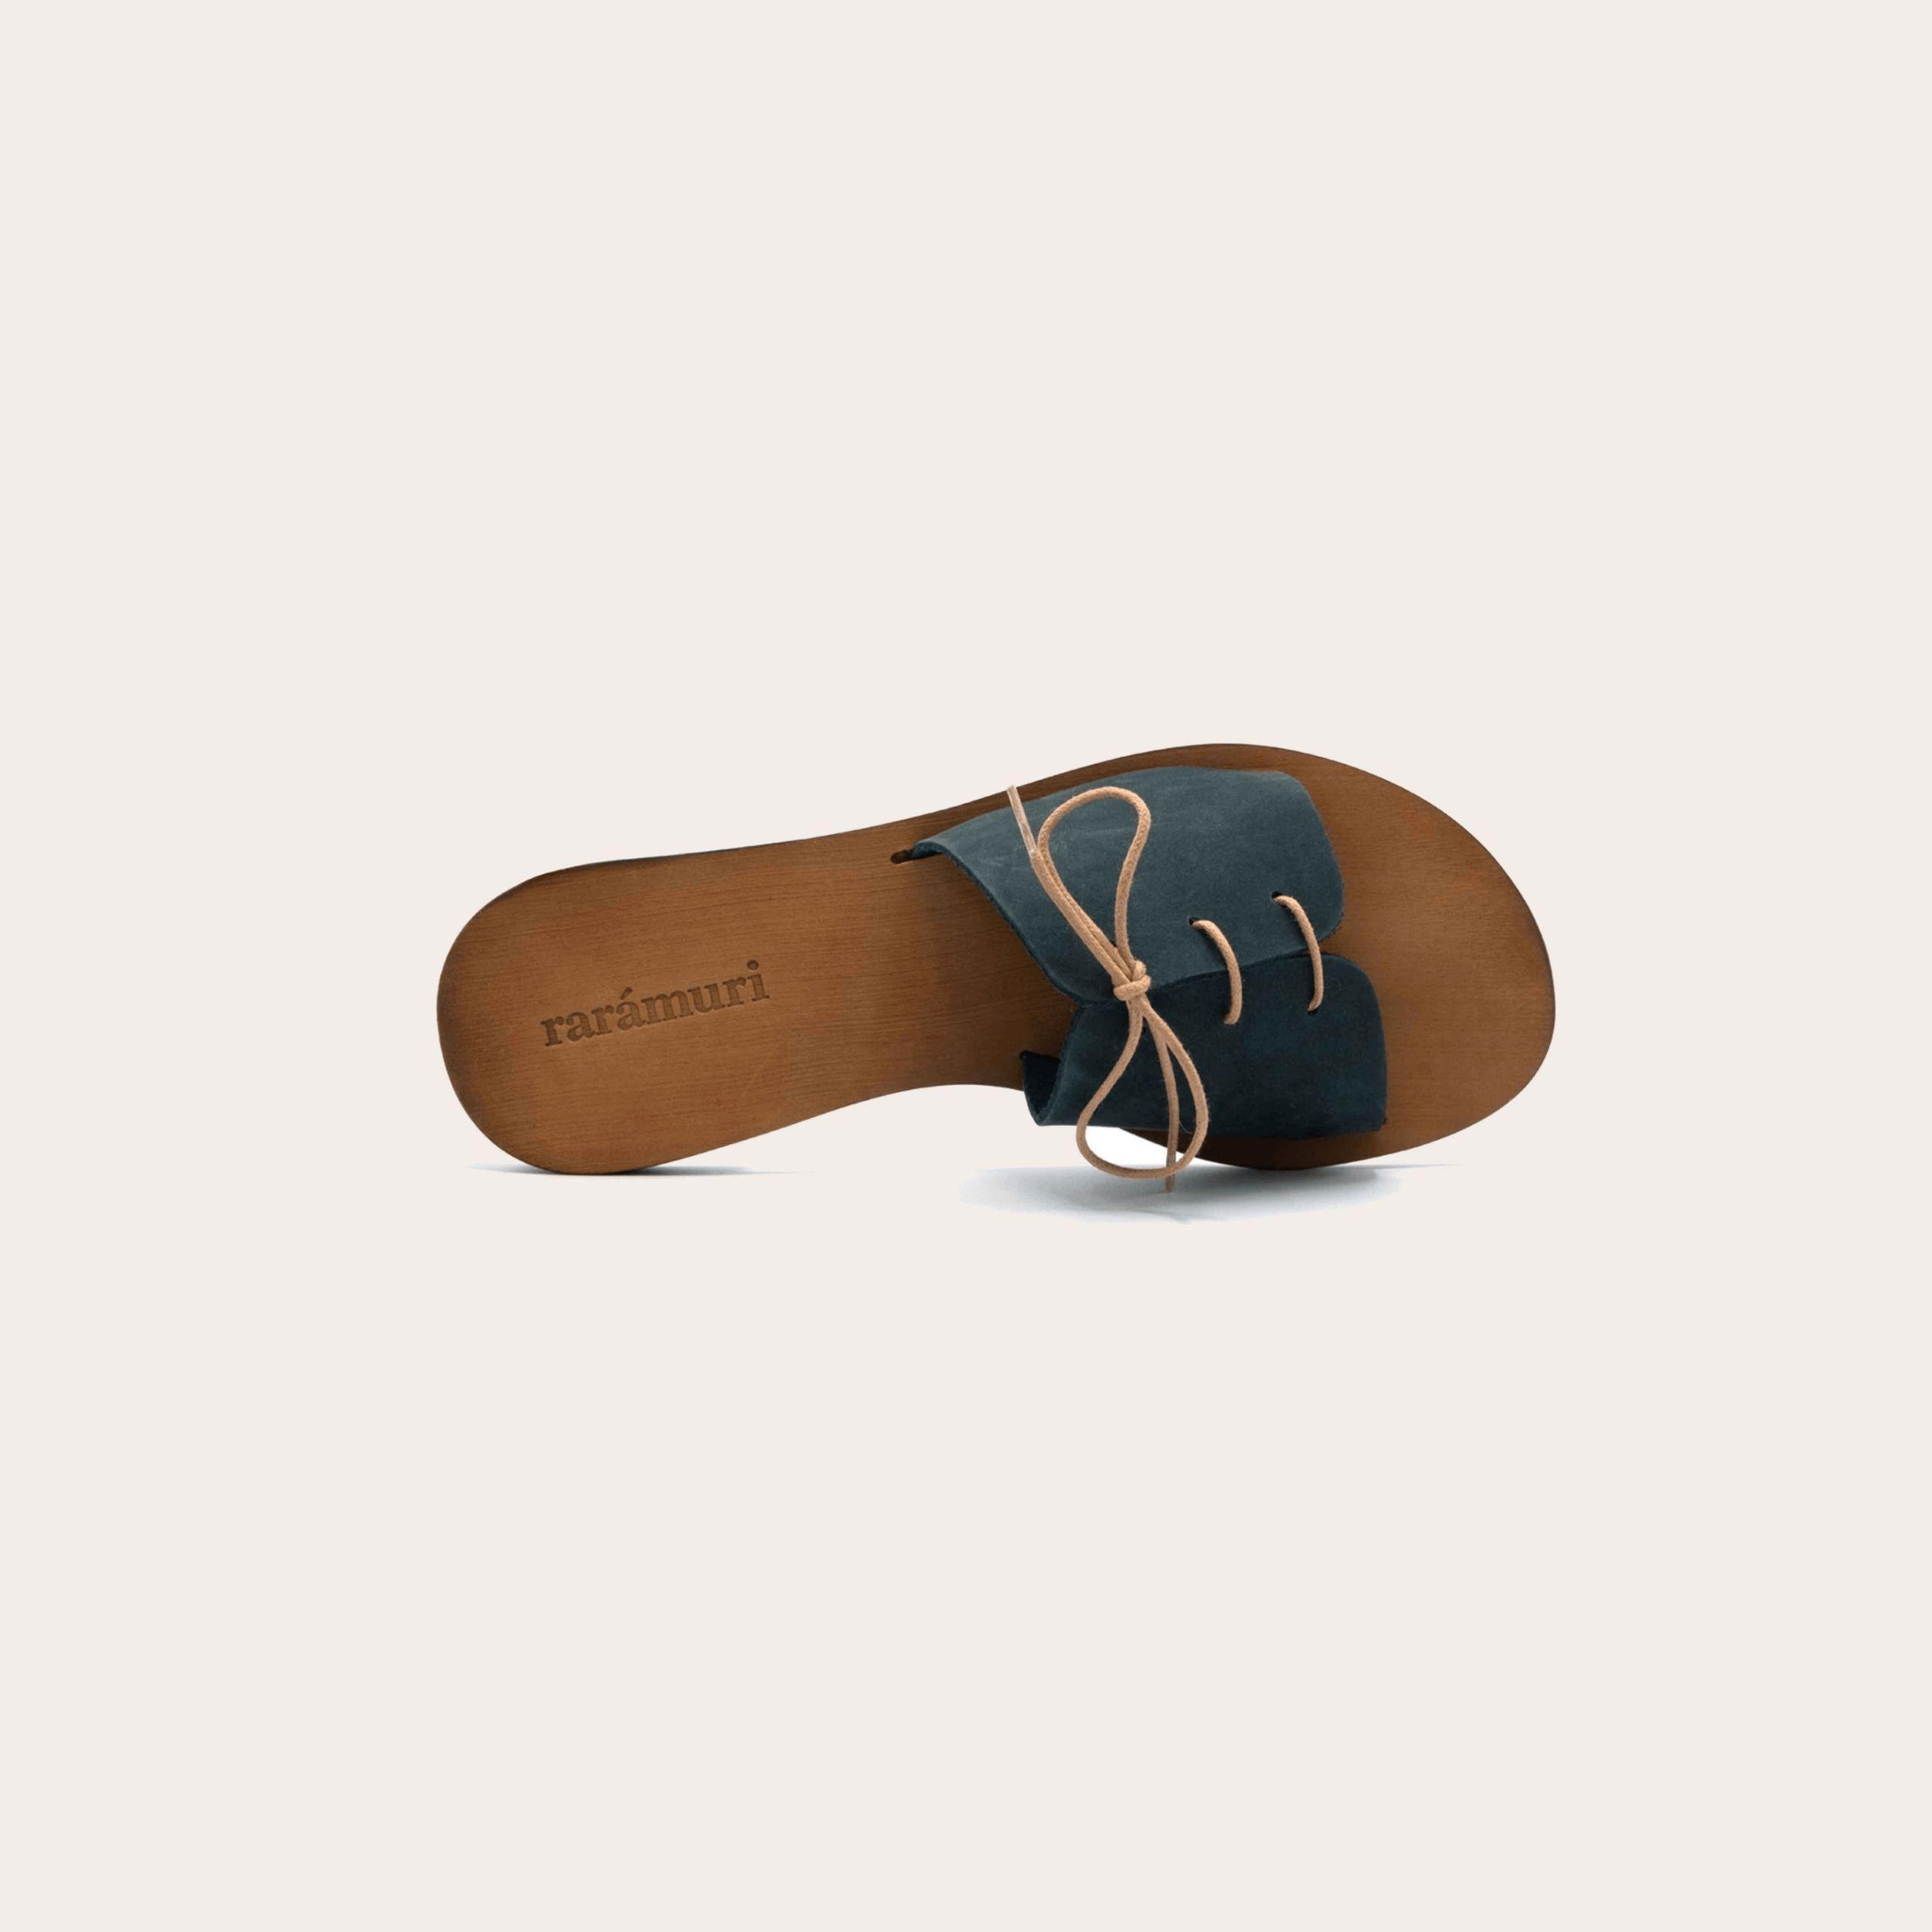 cali-blue-2_lintsandalen sandals travelsandals vegan sustainable sandals wikkelsandalen